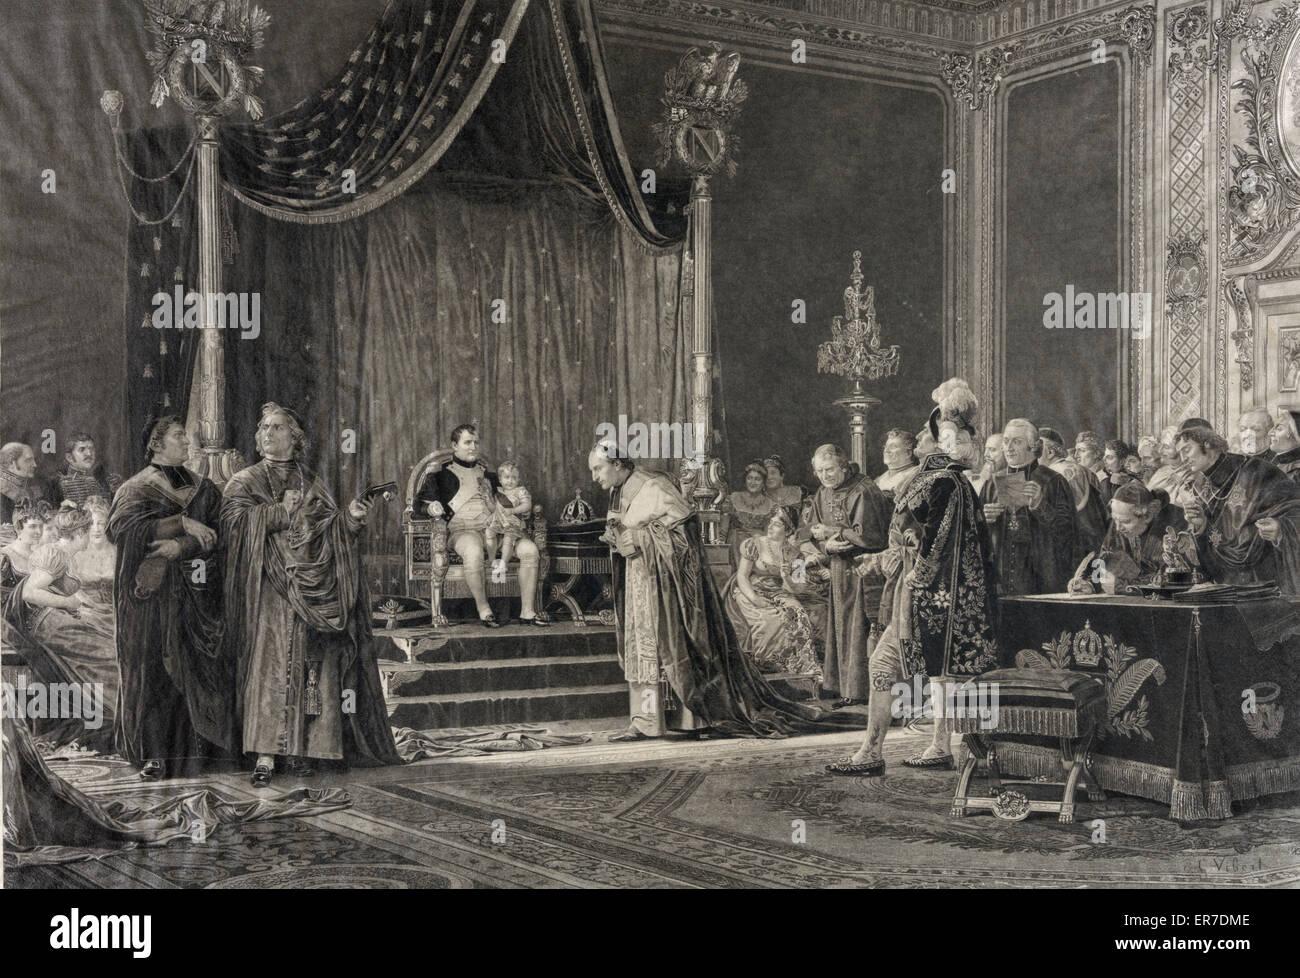 Le Roi de Rome Napoleon king of - Stock Image